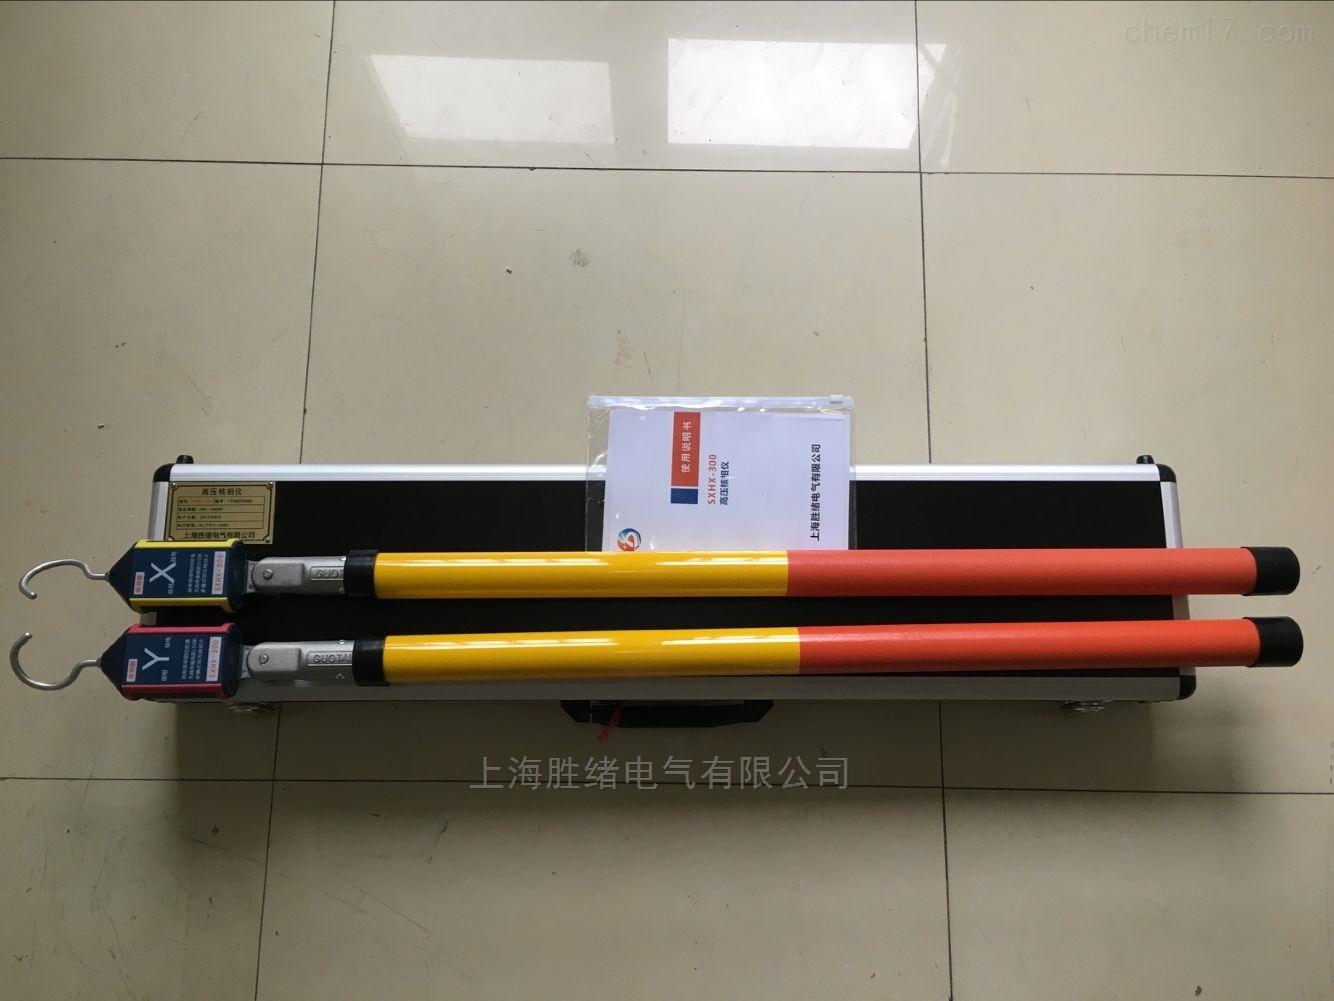 TAG-5000高压相位检测仪